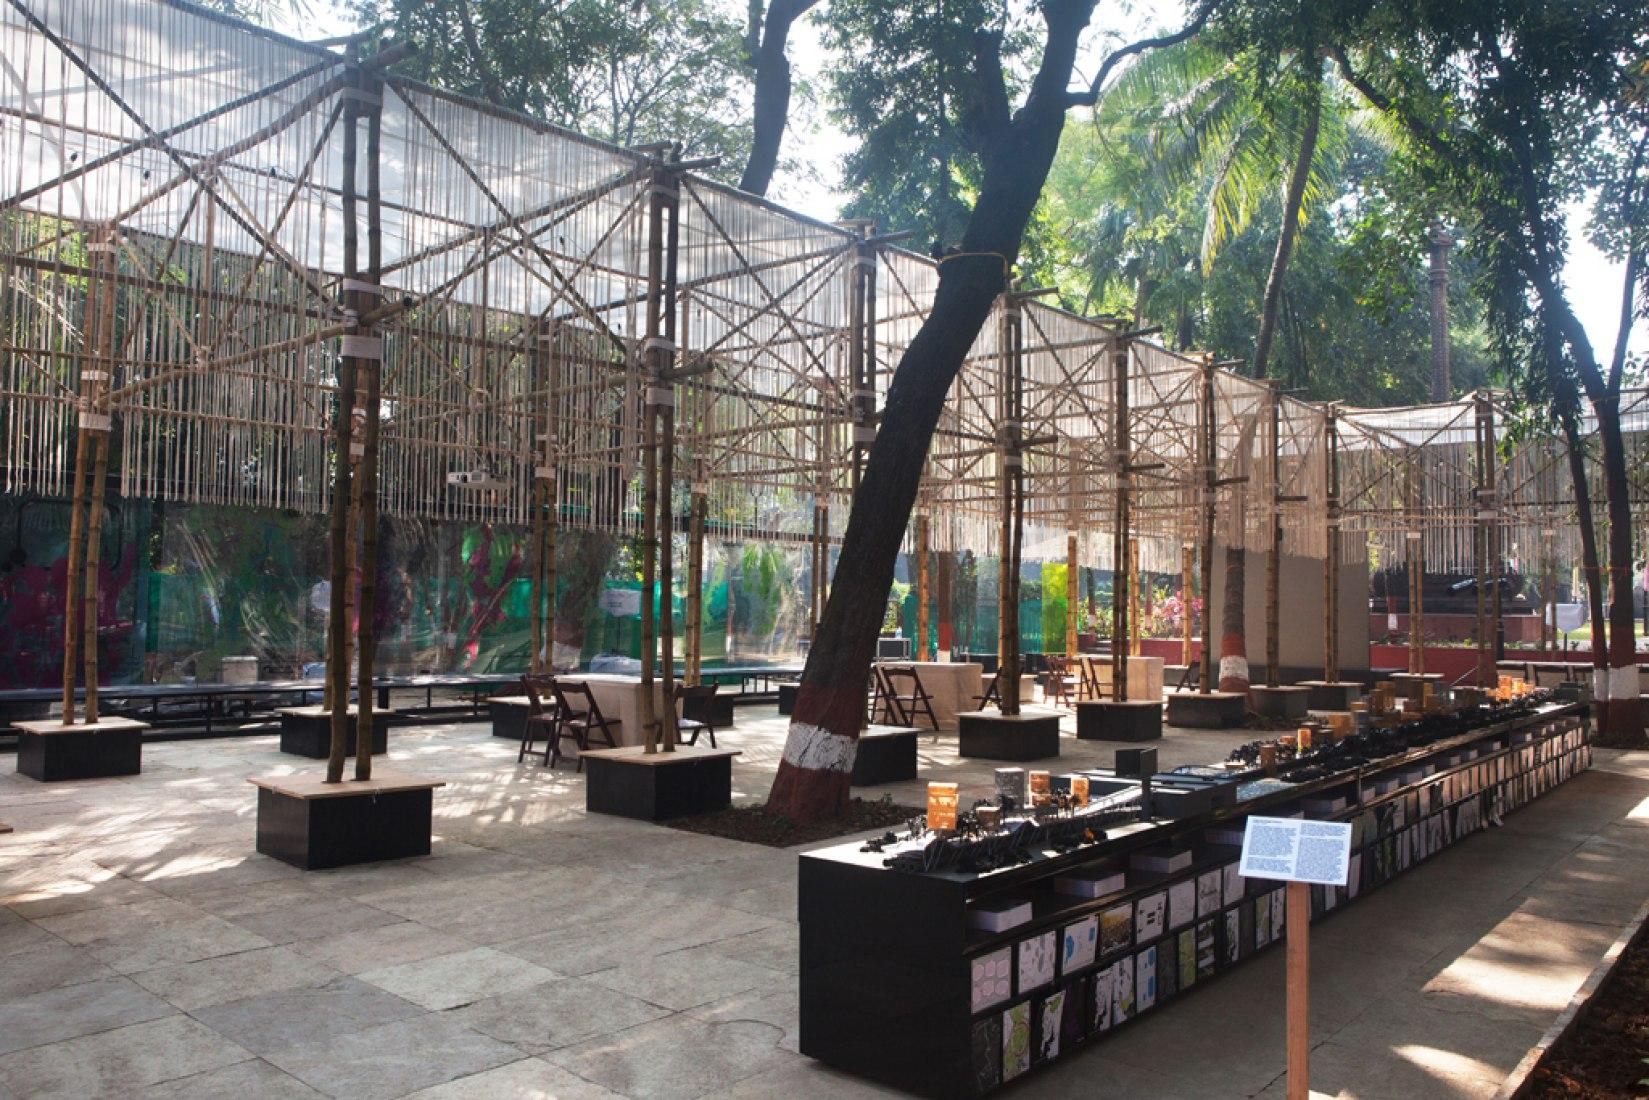 BMW Guggenheim Lab. Central Lab, Dr. Bhau Daji Lad Museum plaza. Photography: Deepshikha Jain © 2012 Solomon R. Guggenheim Foundation.